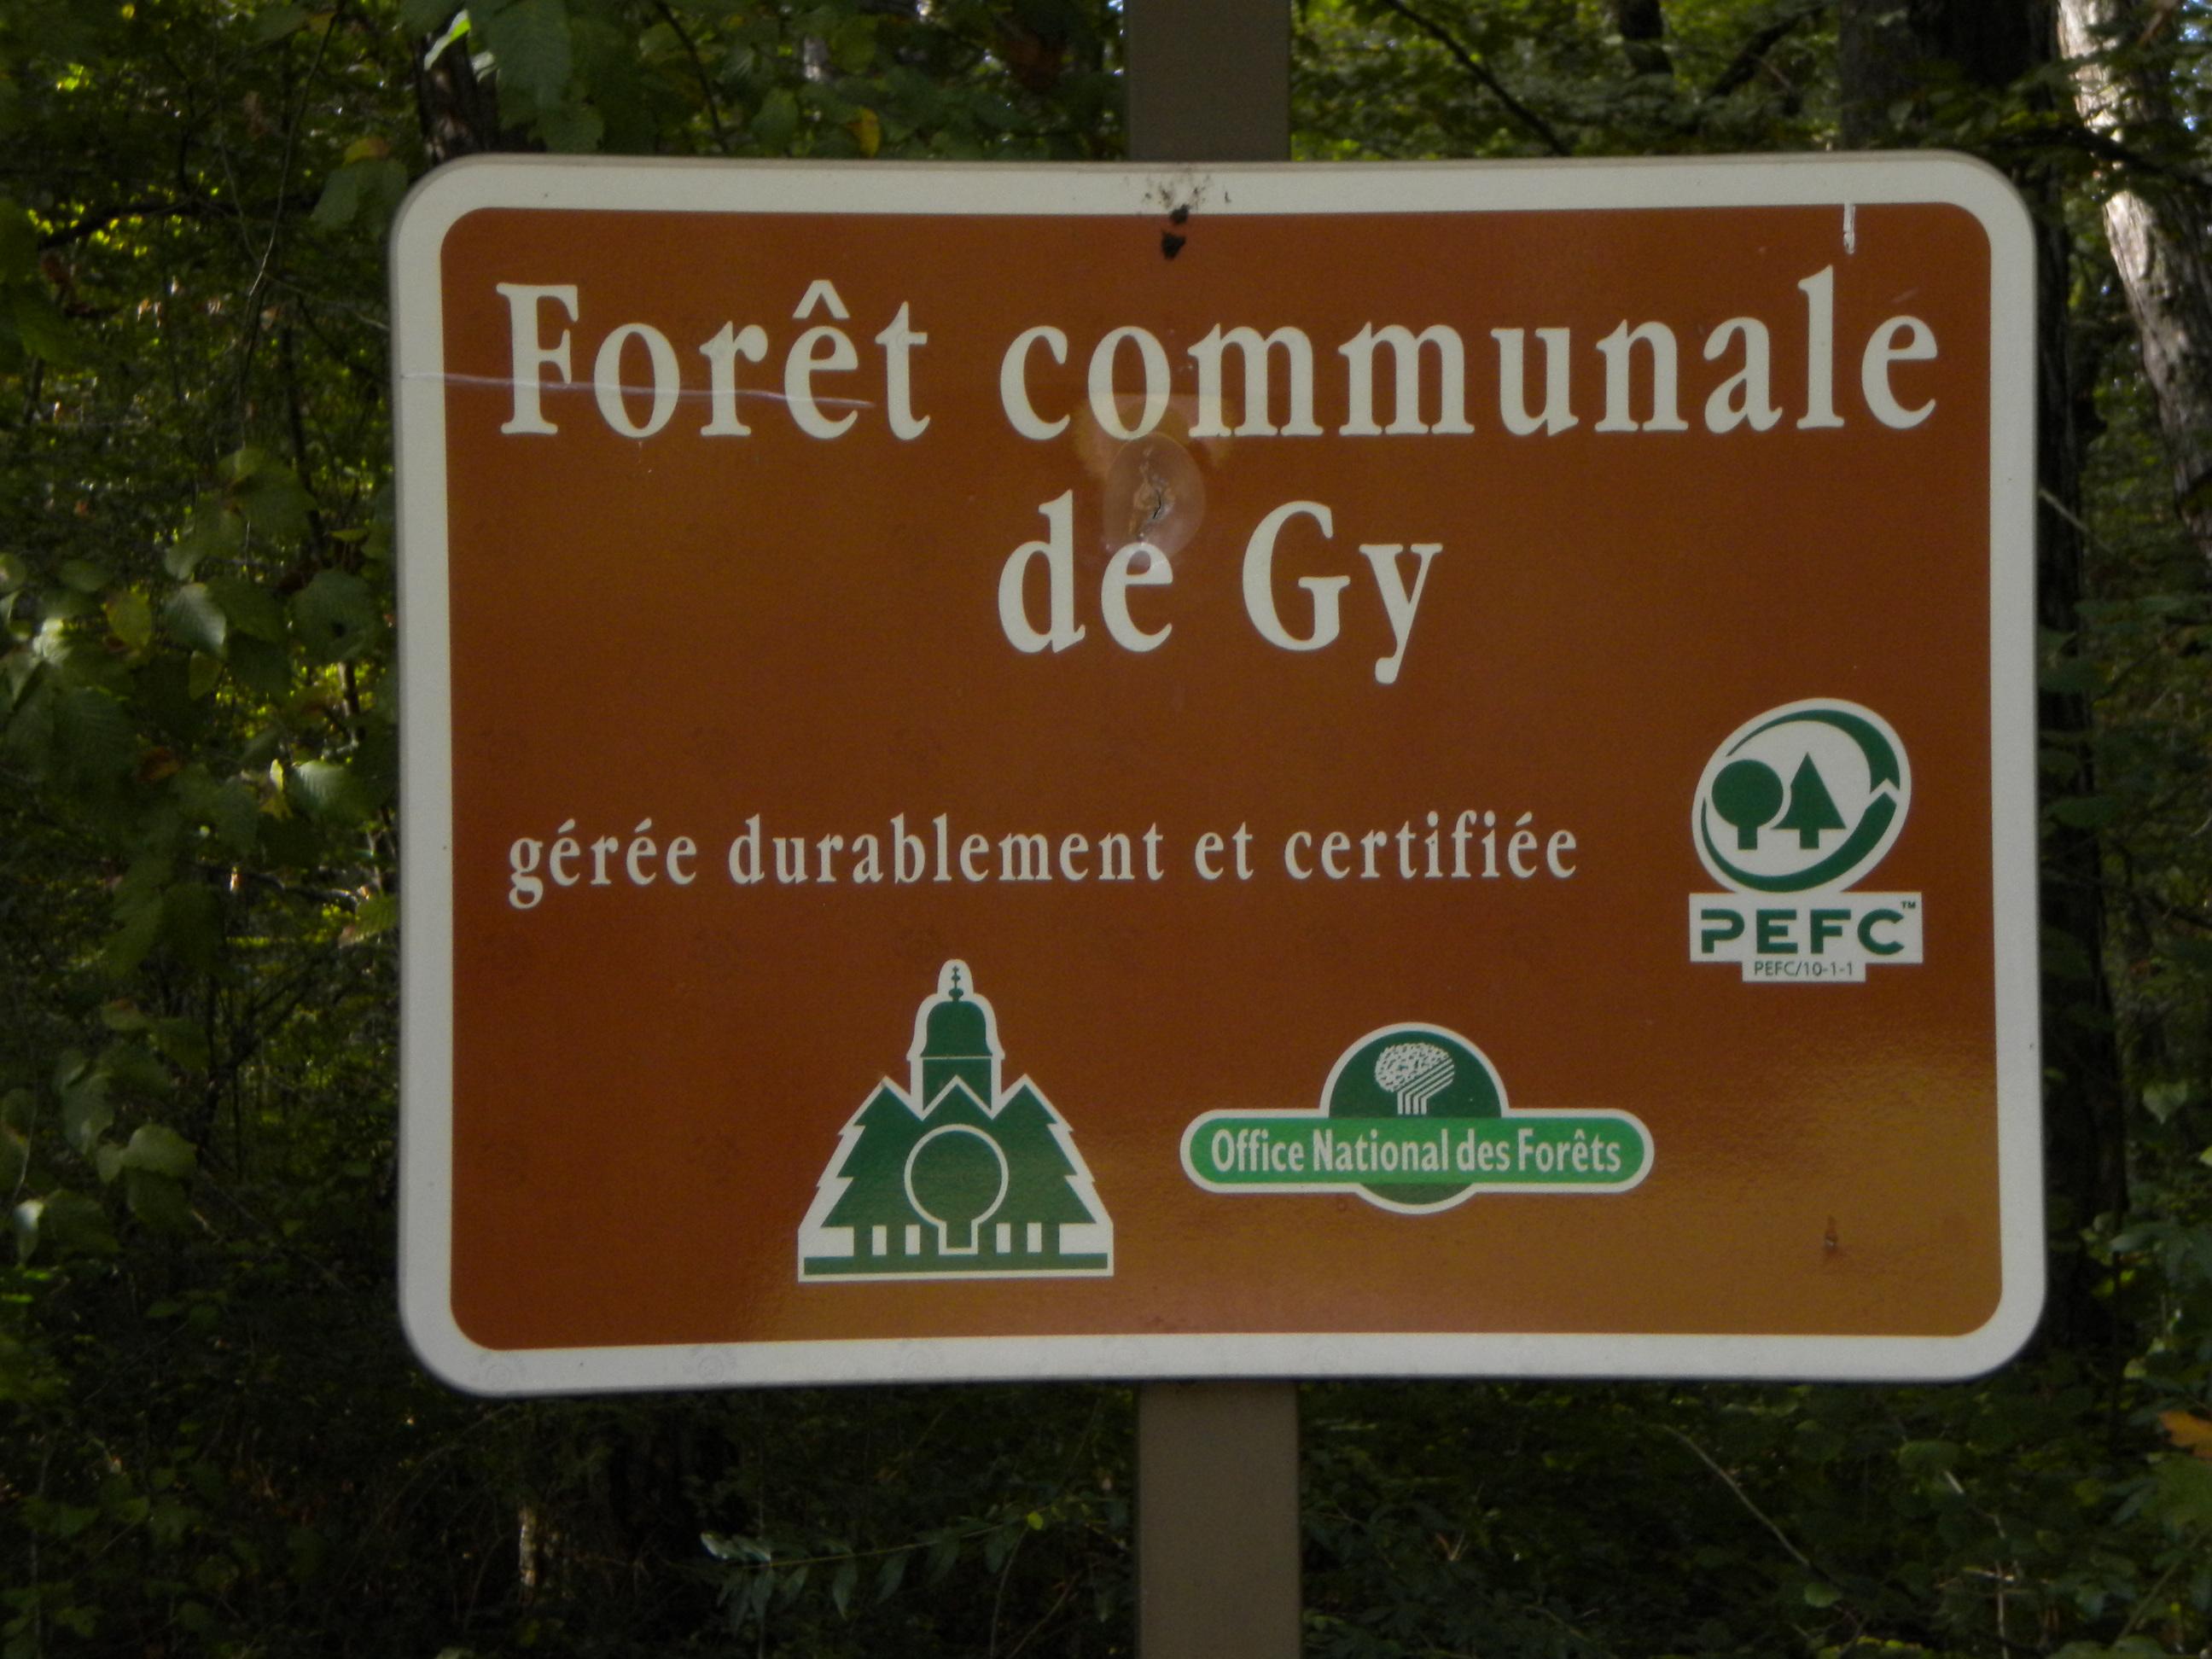 foret-de-gy-021